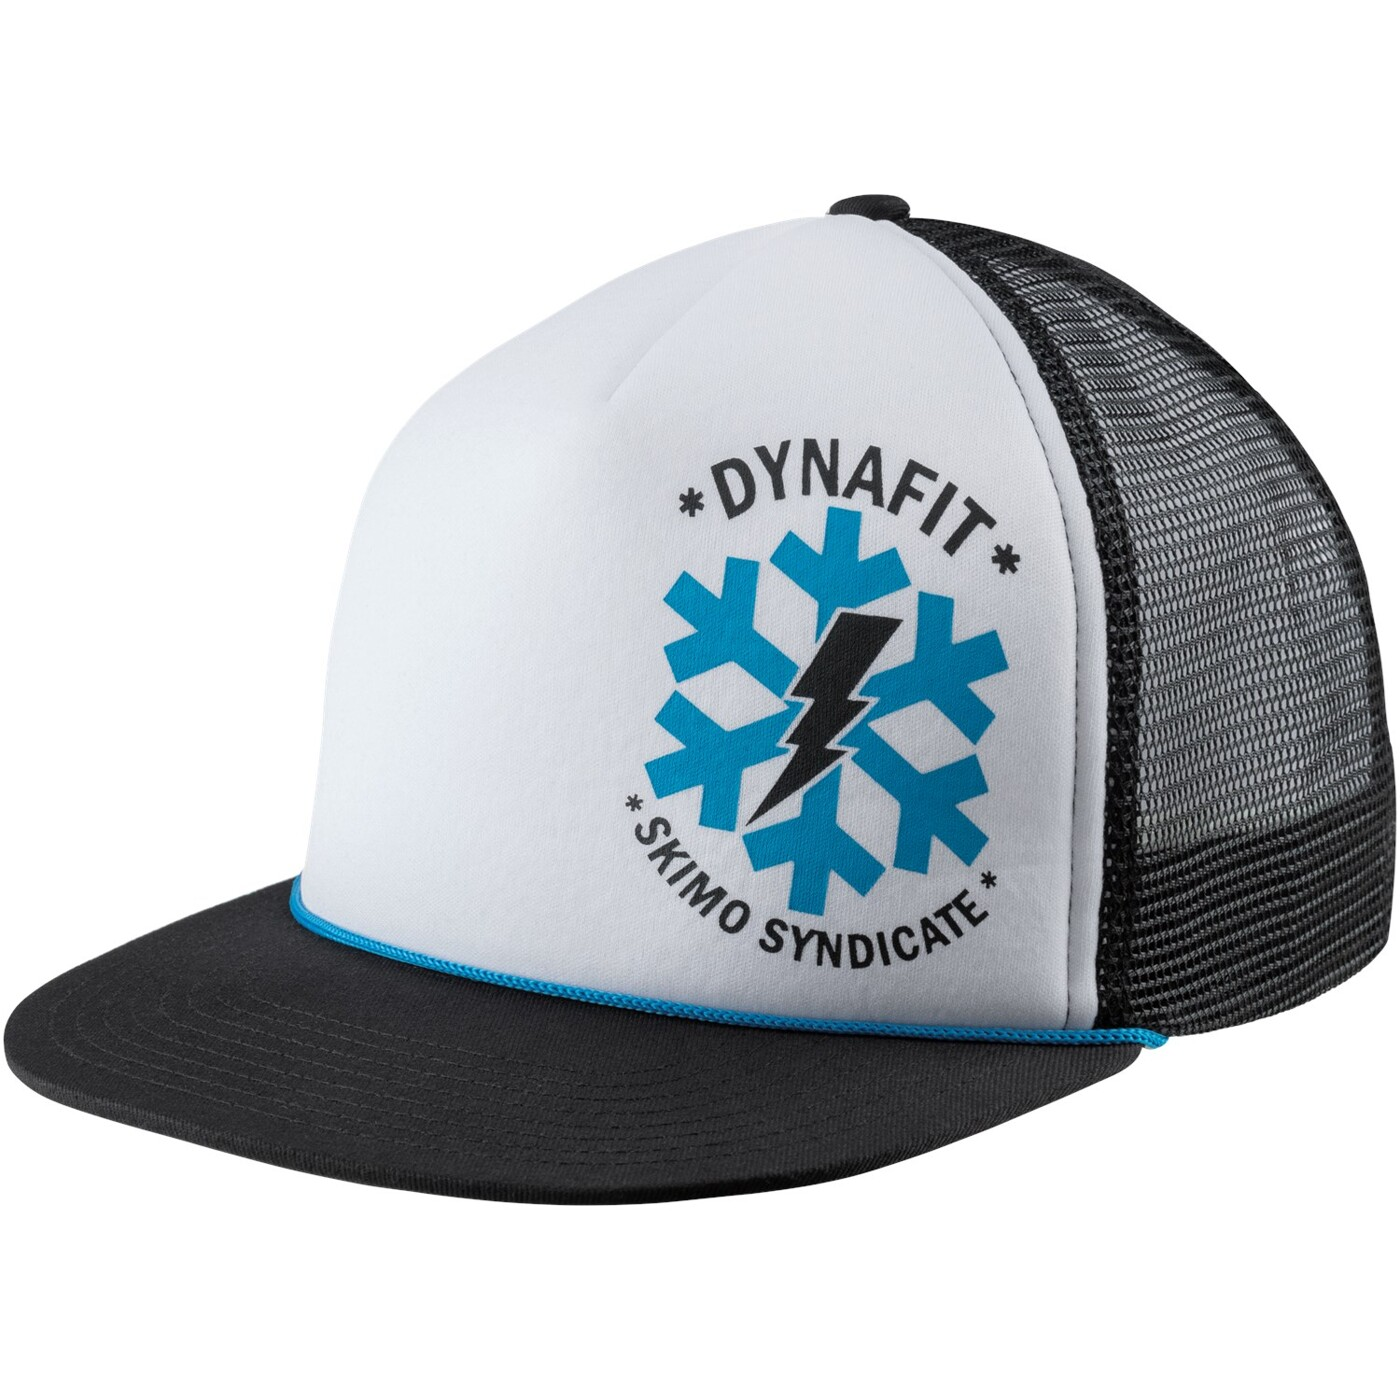 DYNAFIT GRAPHIC TRUCKER CAP - Herren